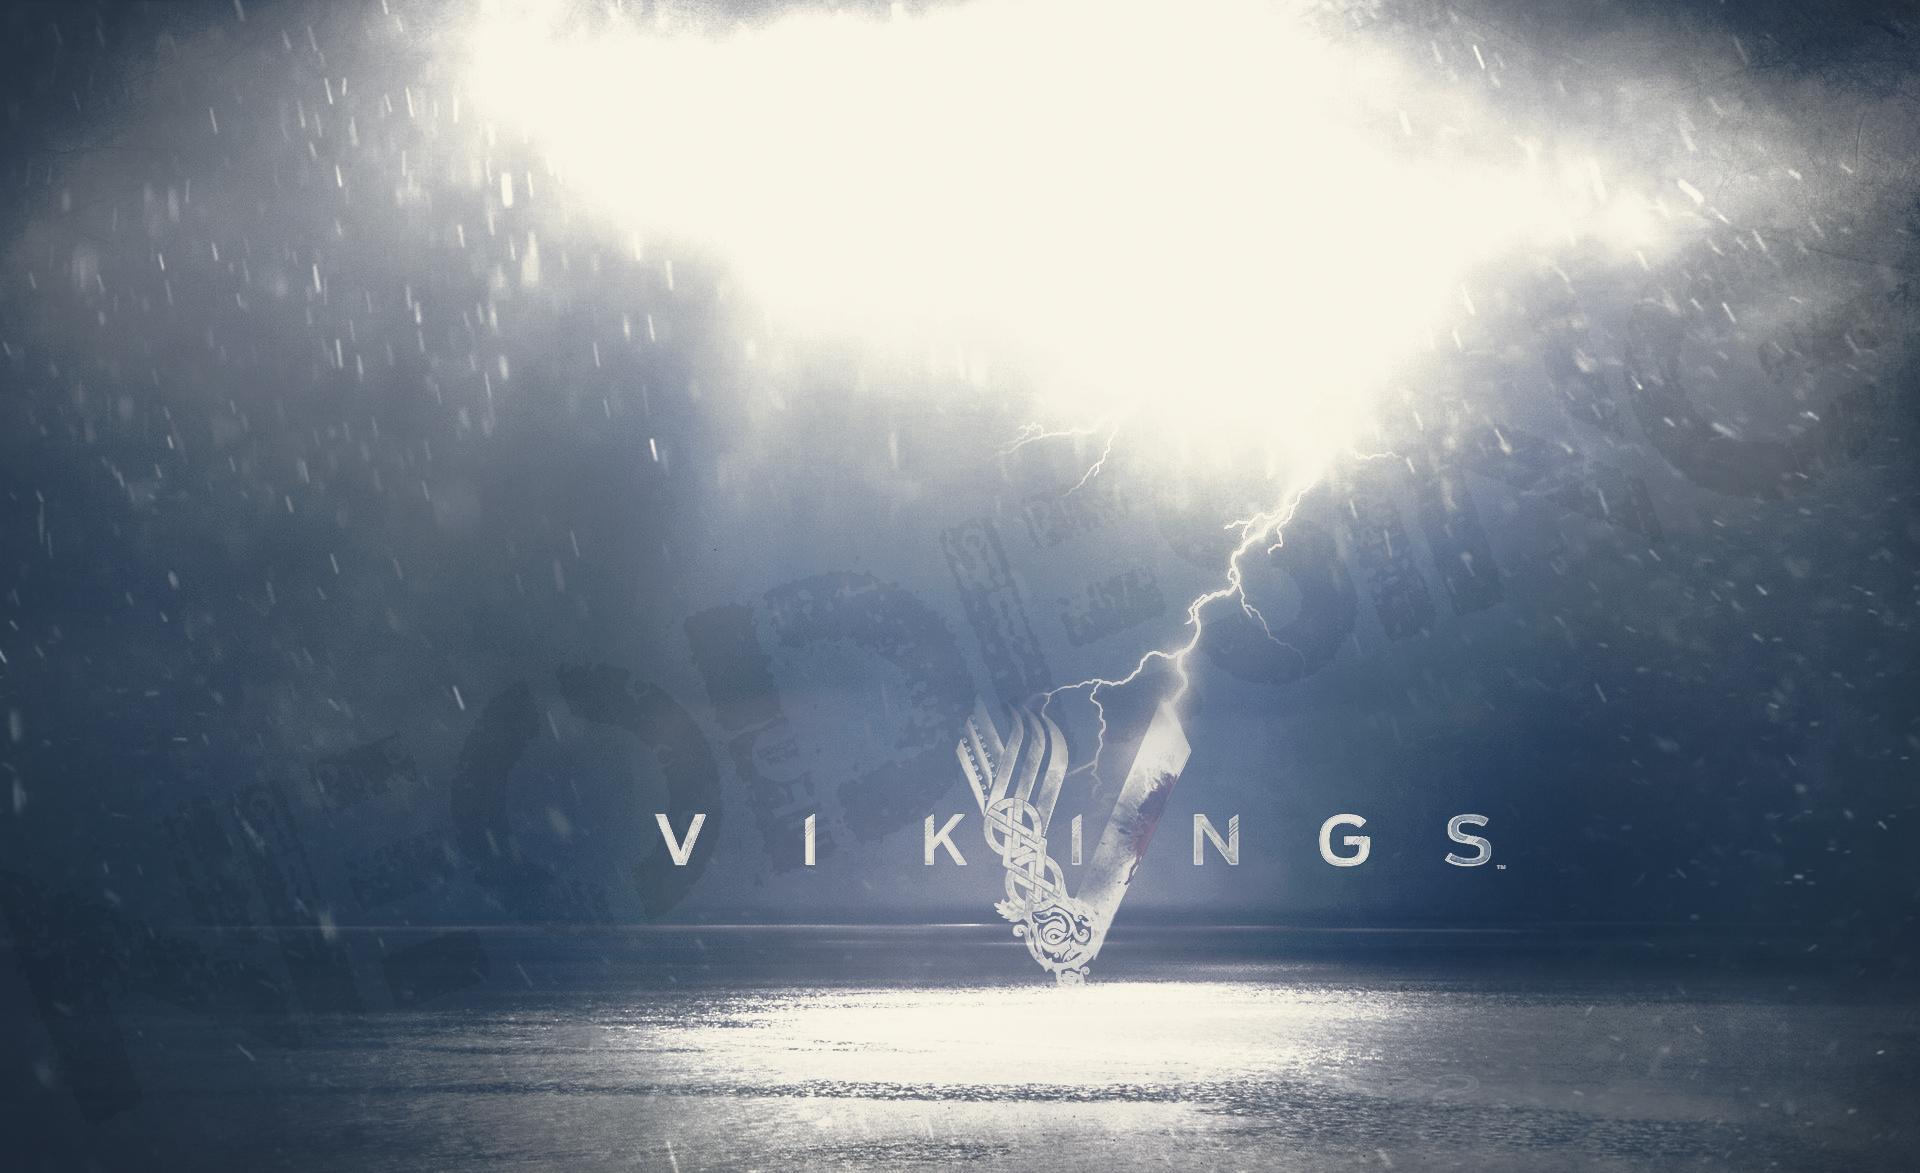 vikings tv series wallpaper photoshop cs6 making time 1 hours 1920x1173